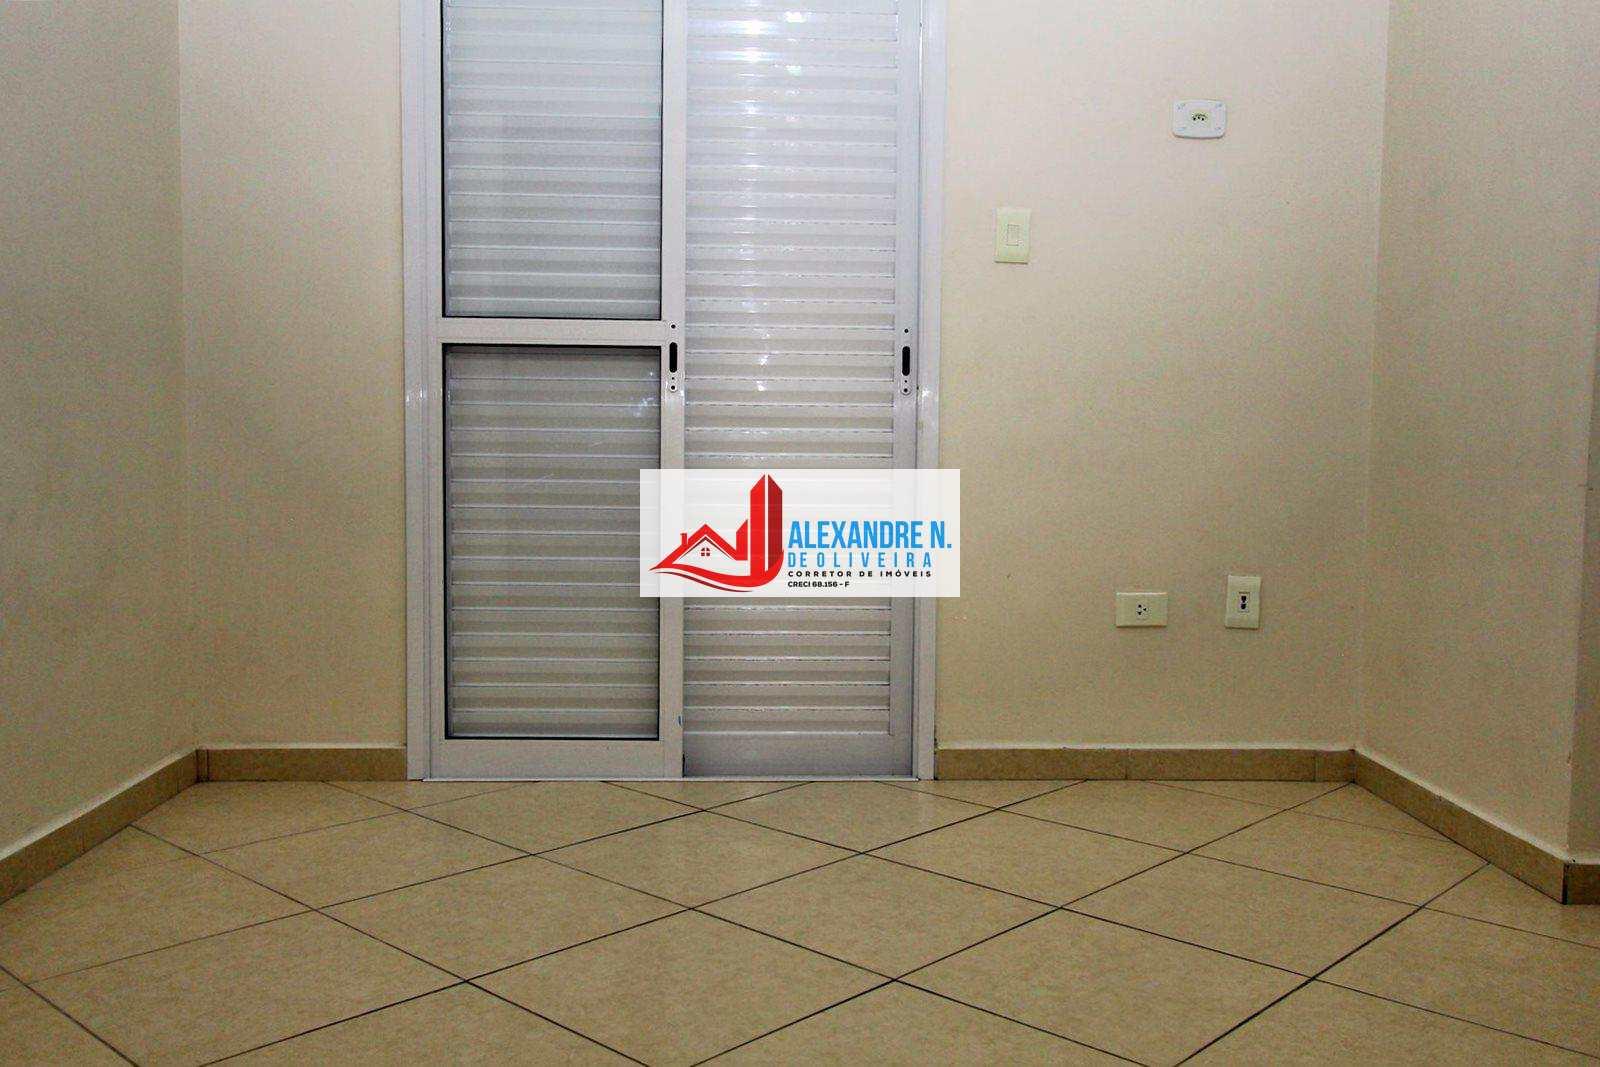 Apto 2 dorms, Guilhermina, Praia Grande, R$ 350 mil, AP00501.